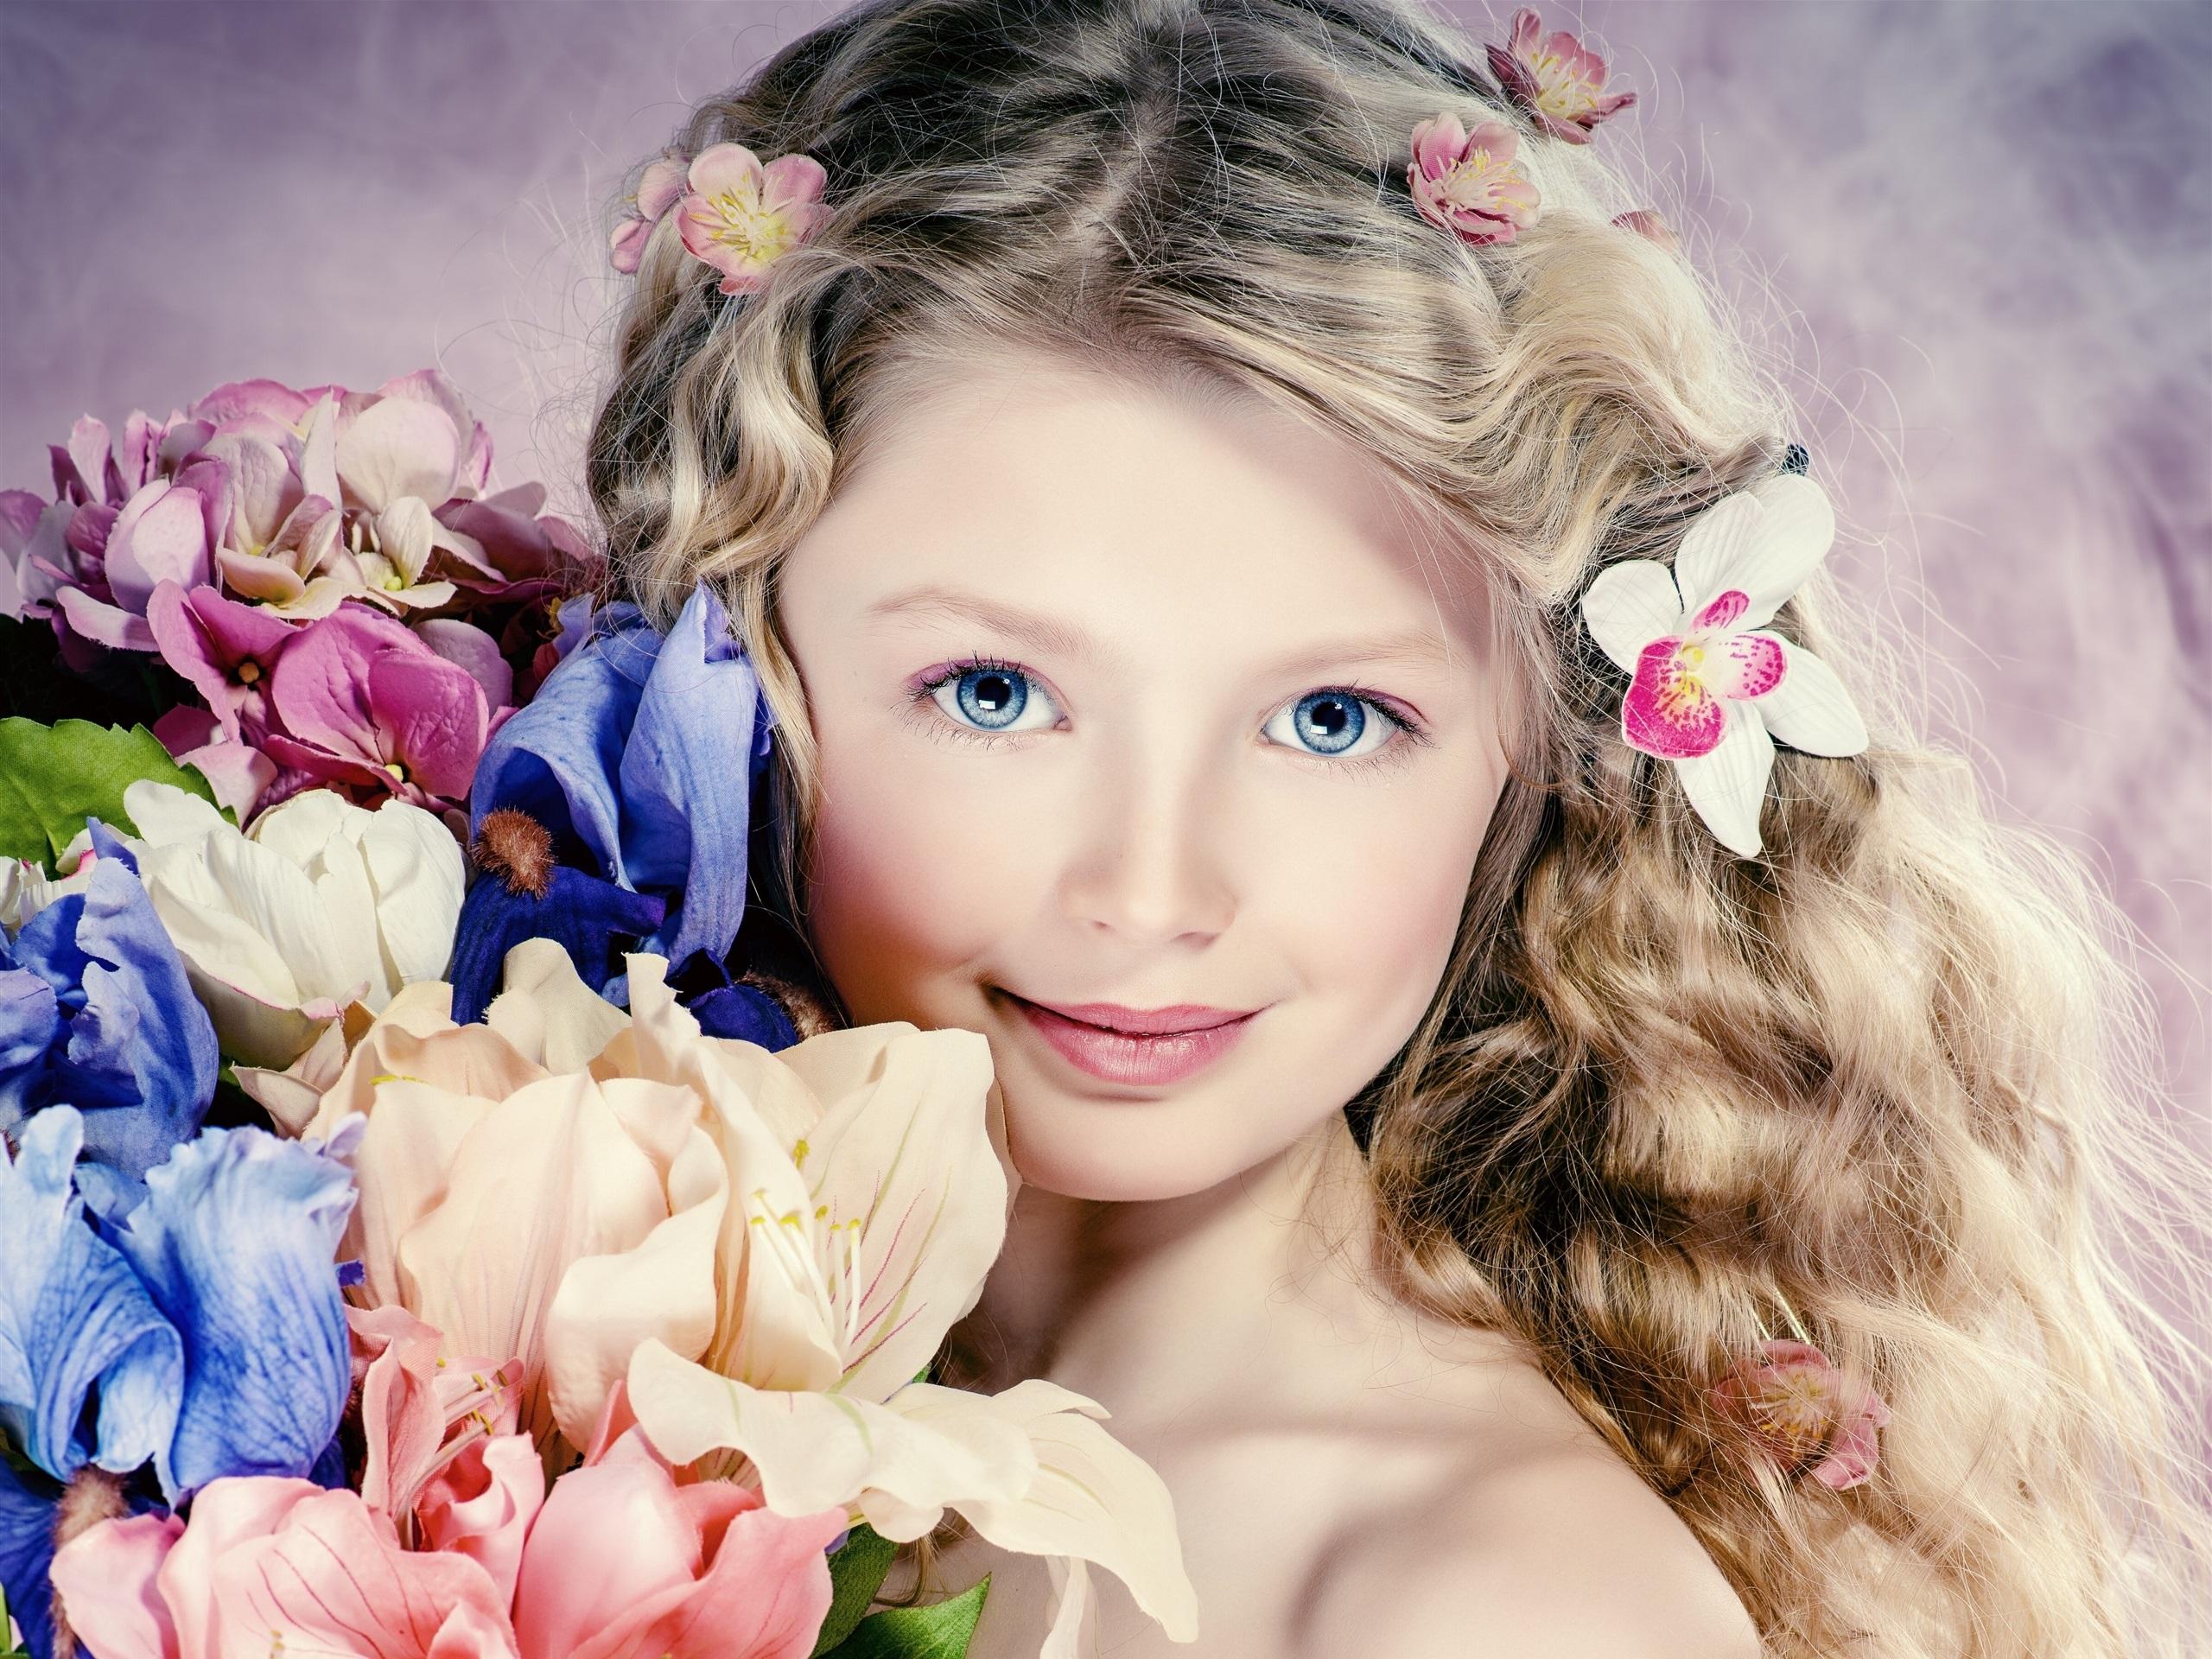 Wallpaper cute girl portrait curly hair flowers blue eyes download this wallpaper izmirmasajfo